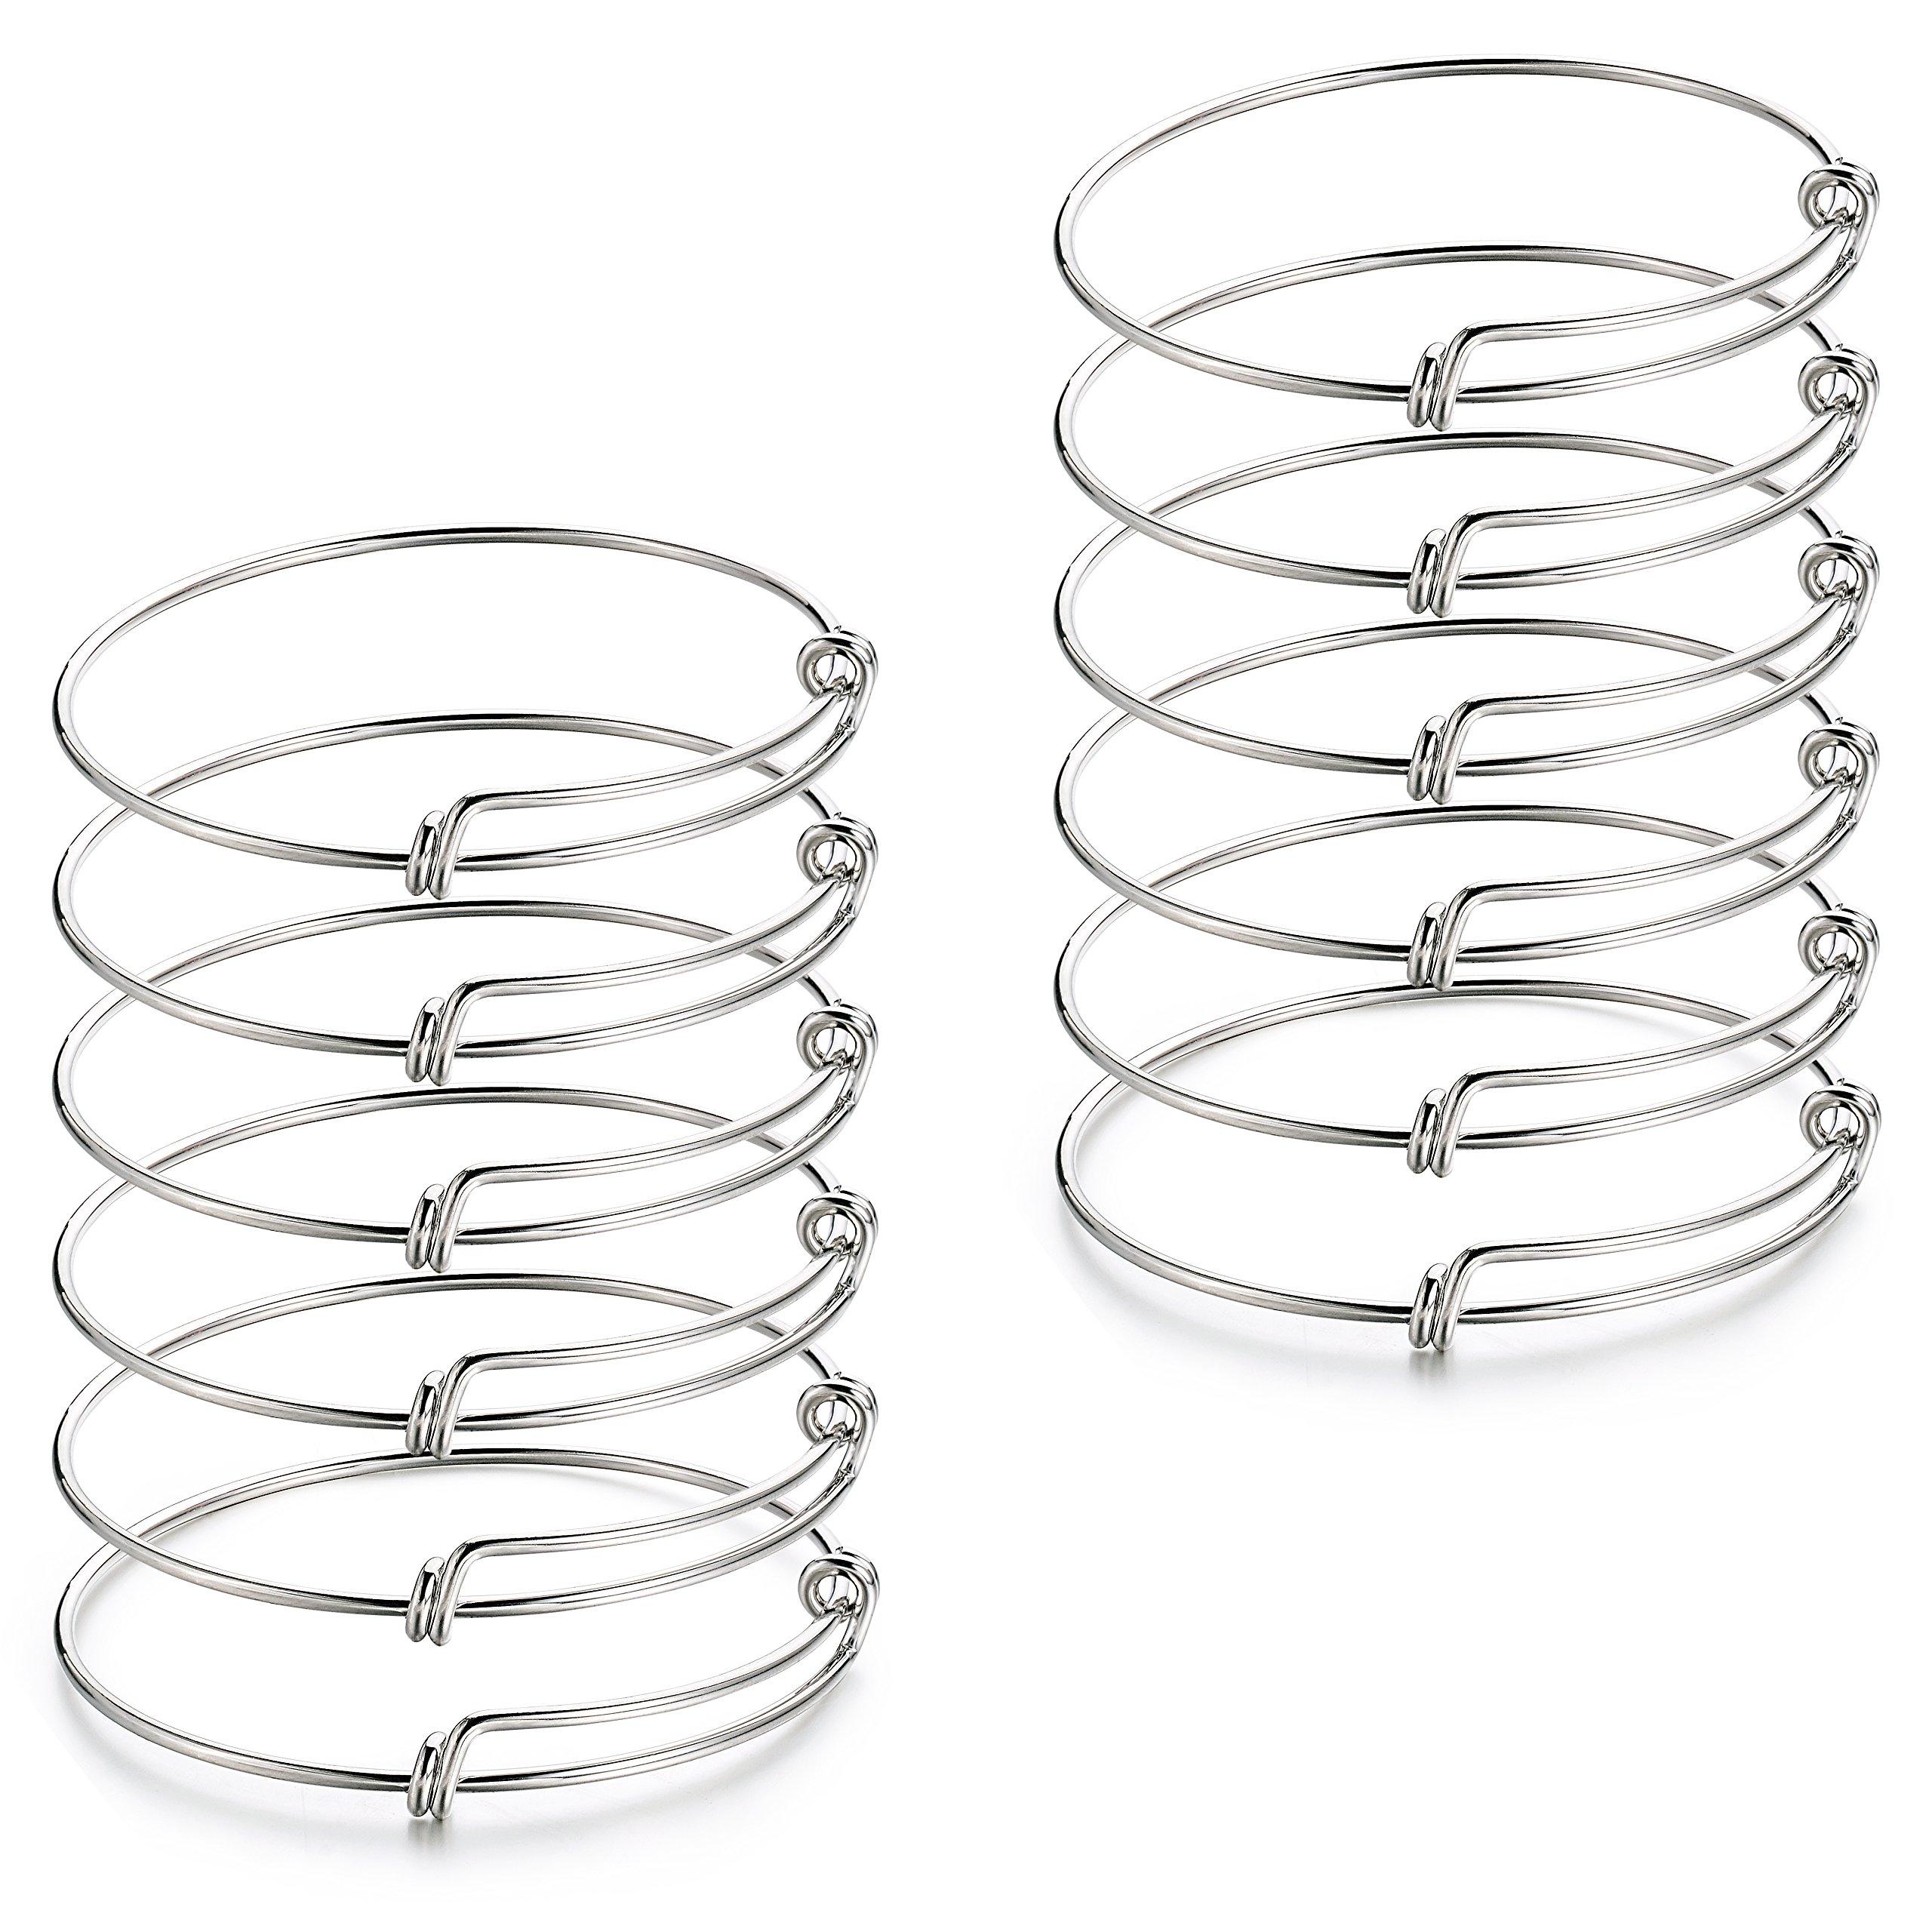 2.6 inch 12 pcs Expandable Adjustable Wire Blank Charms Bangle Bracelet for Women,Men, DIY Jewelry Making by ZC LI JEWELRY